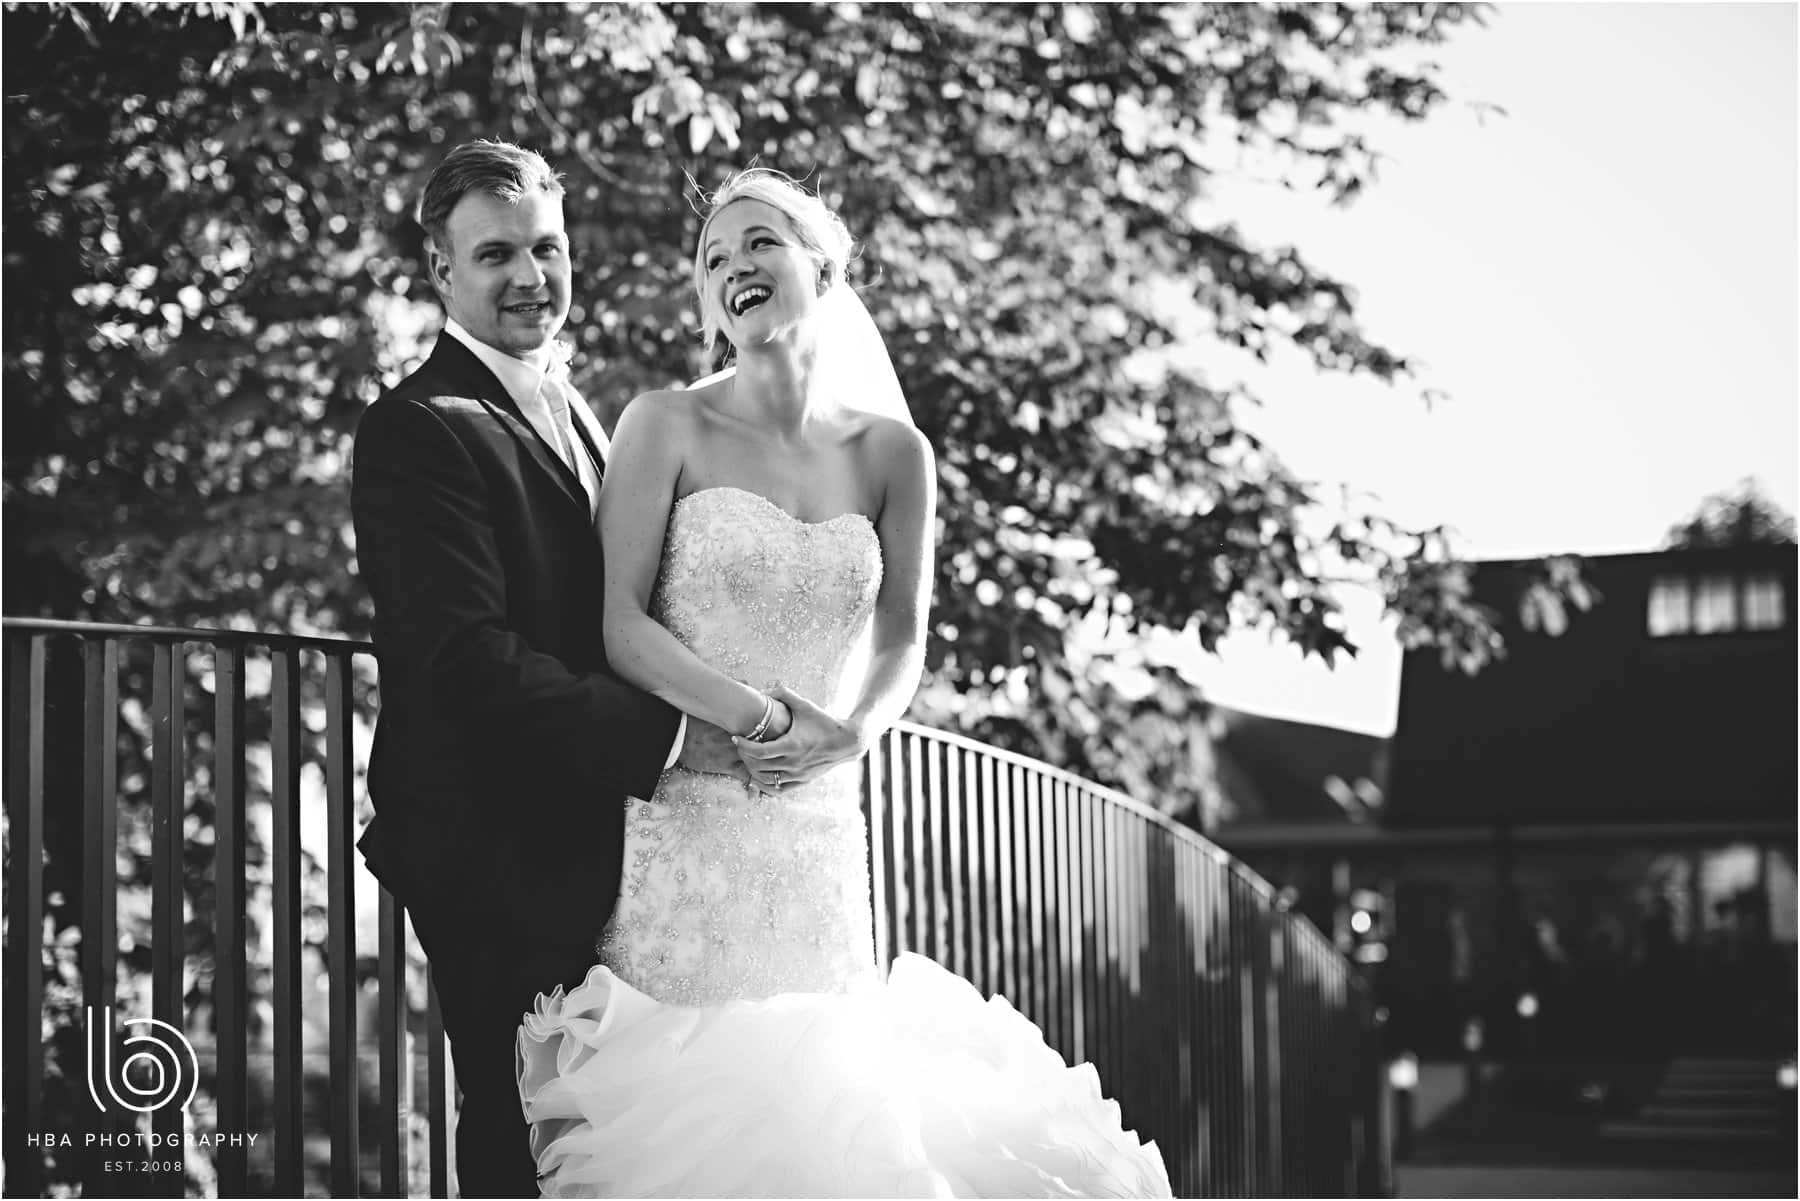 the bride & Groom on a bridge